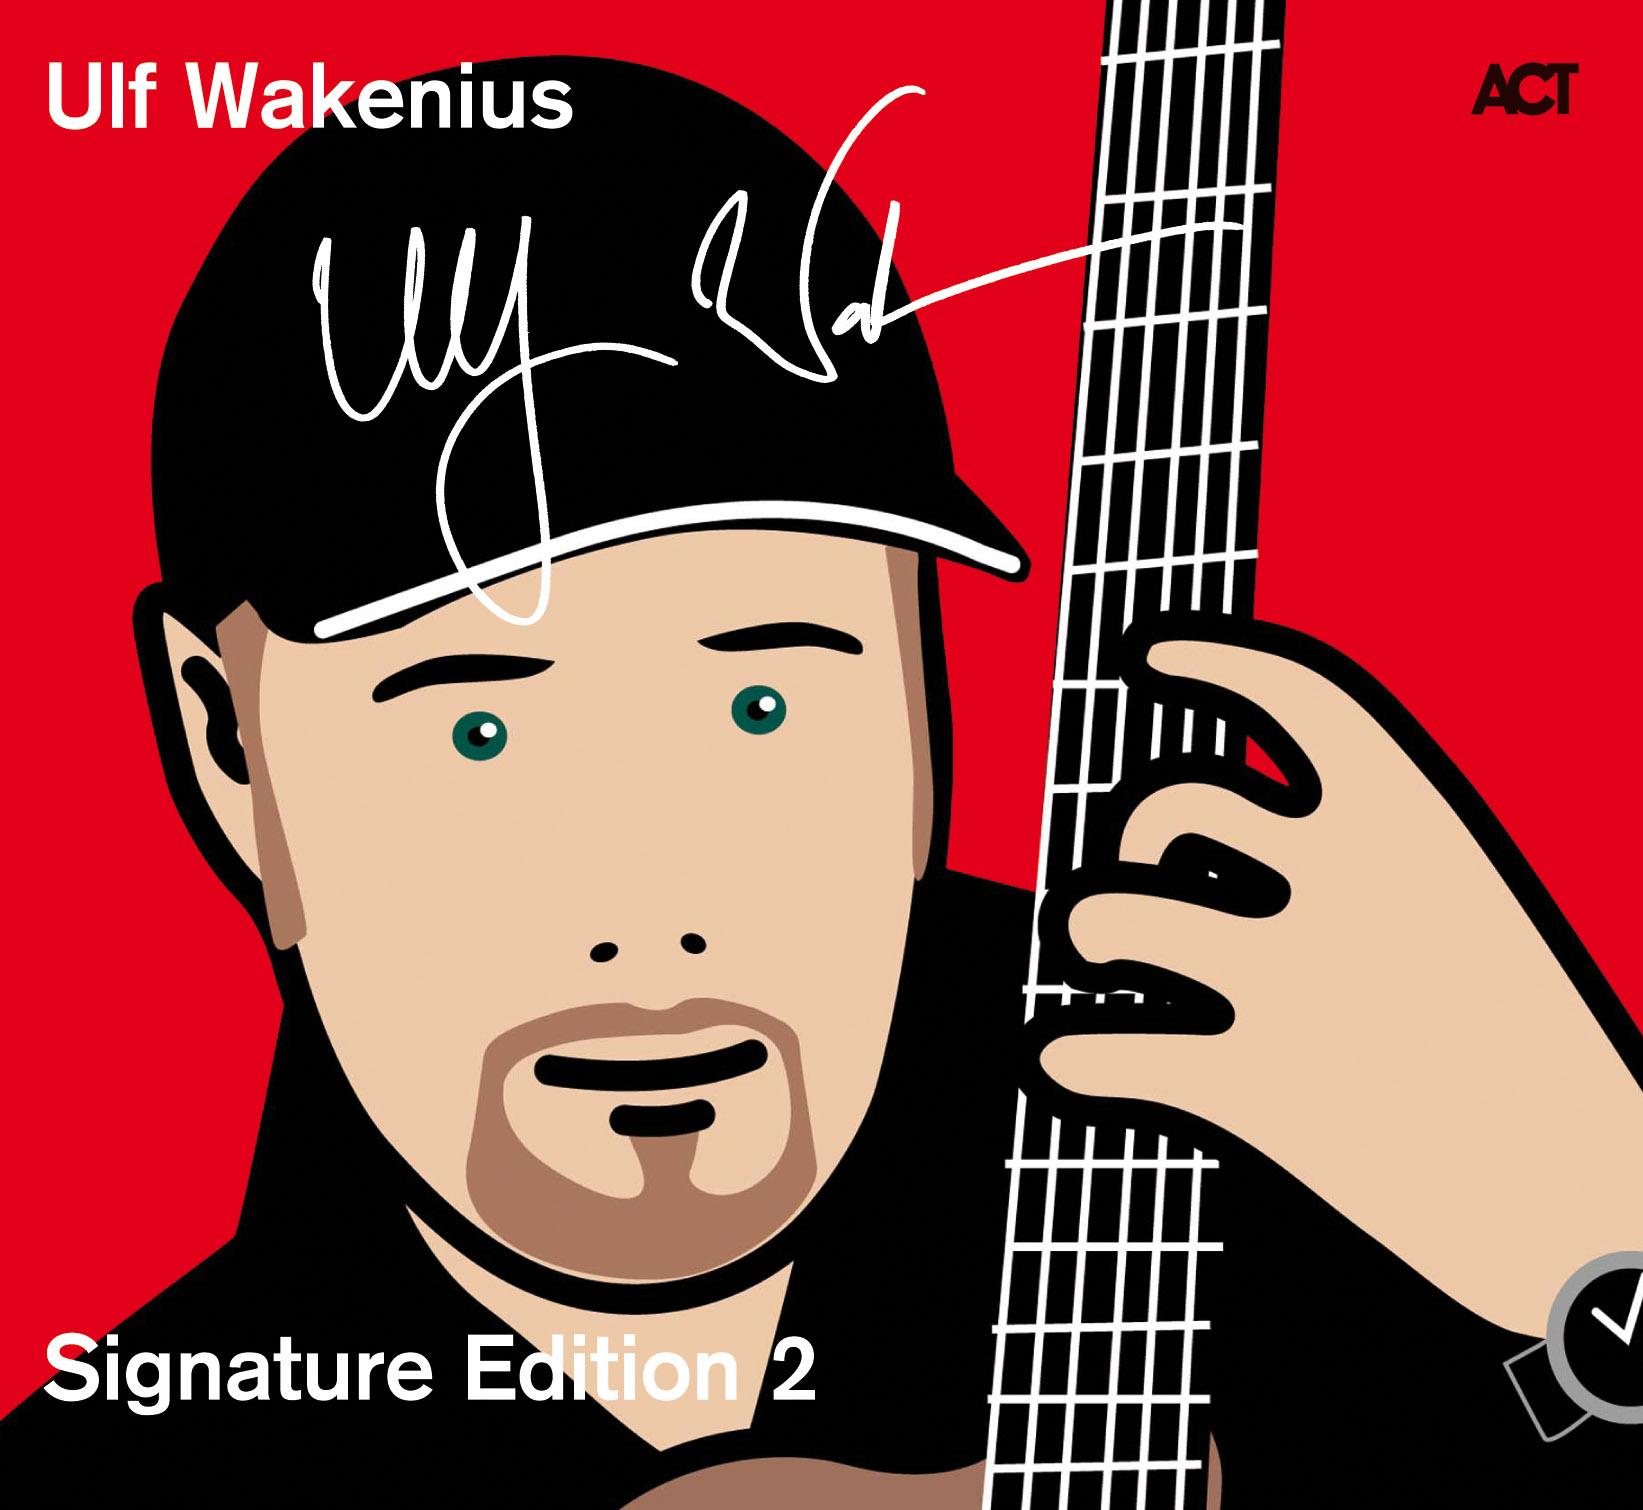 2010 - Ulf Wakenius - Signature Edition 2.jpg